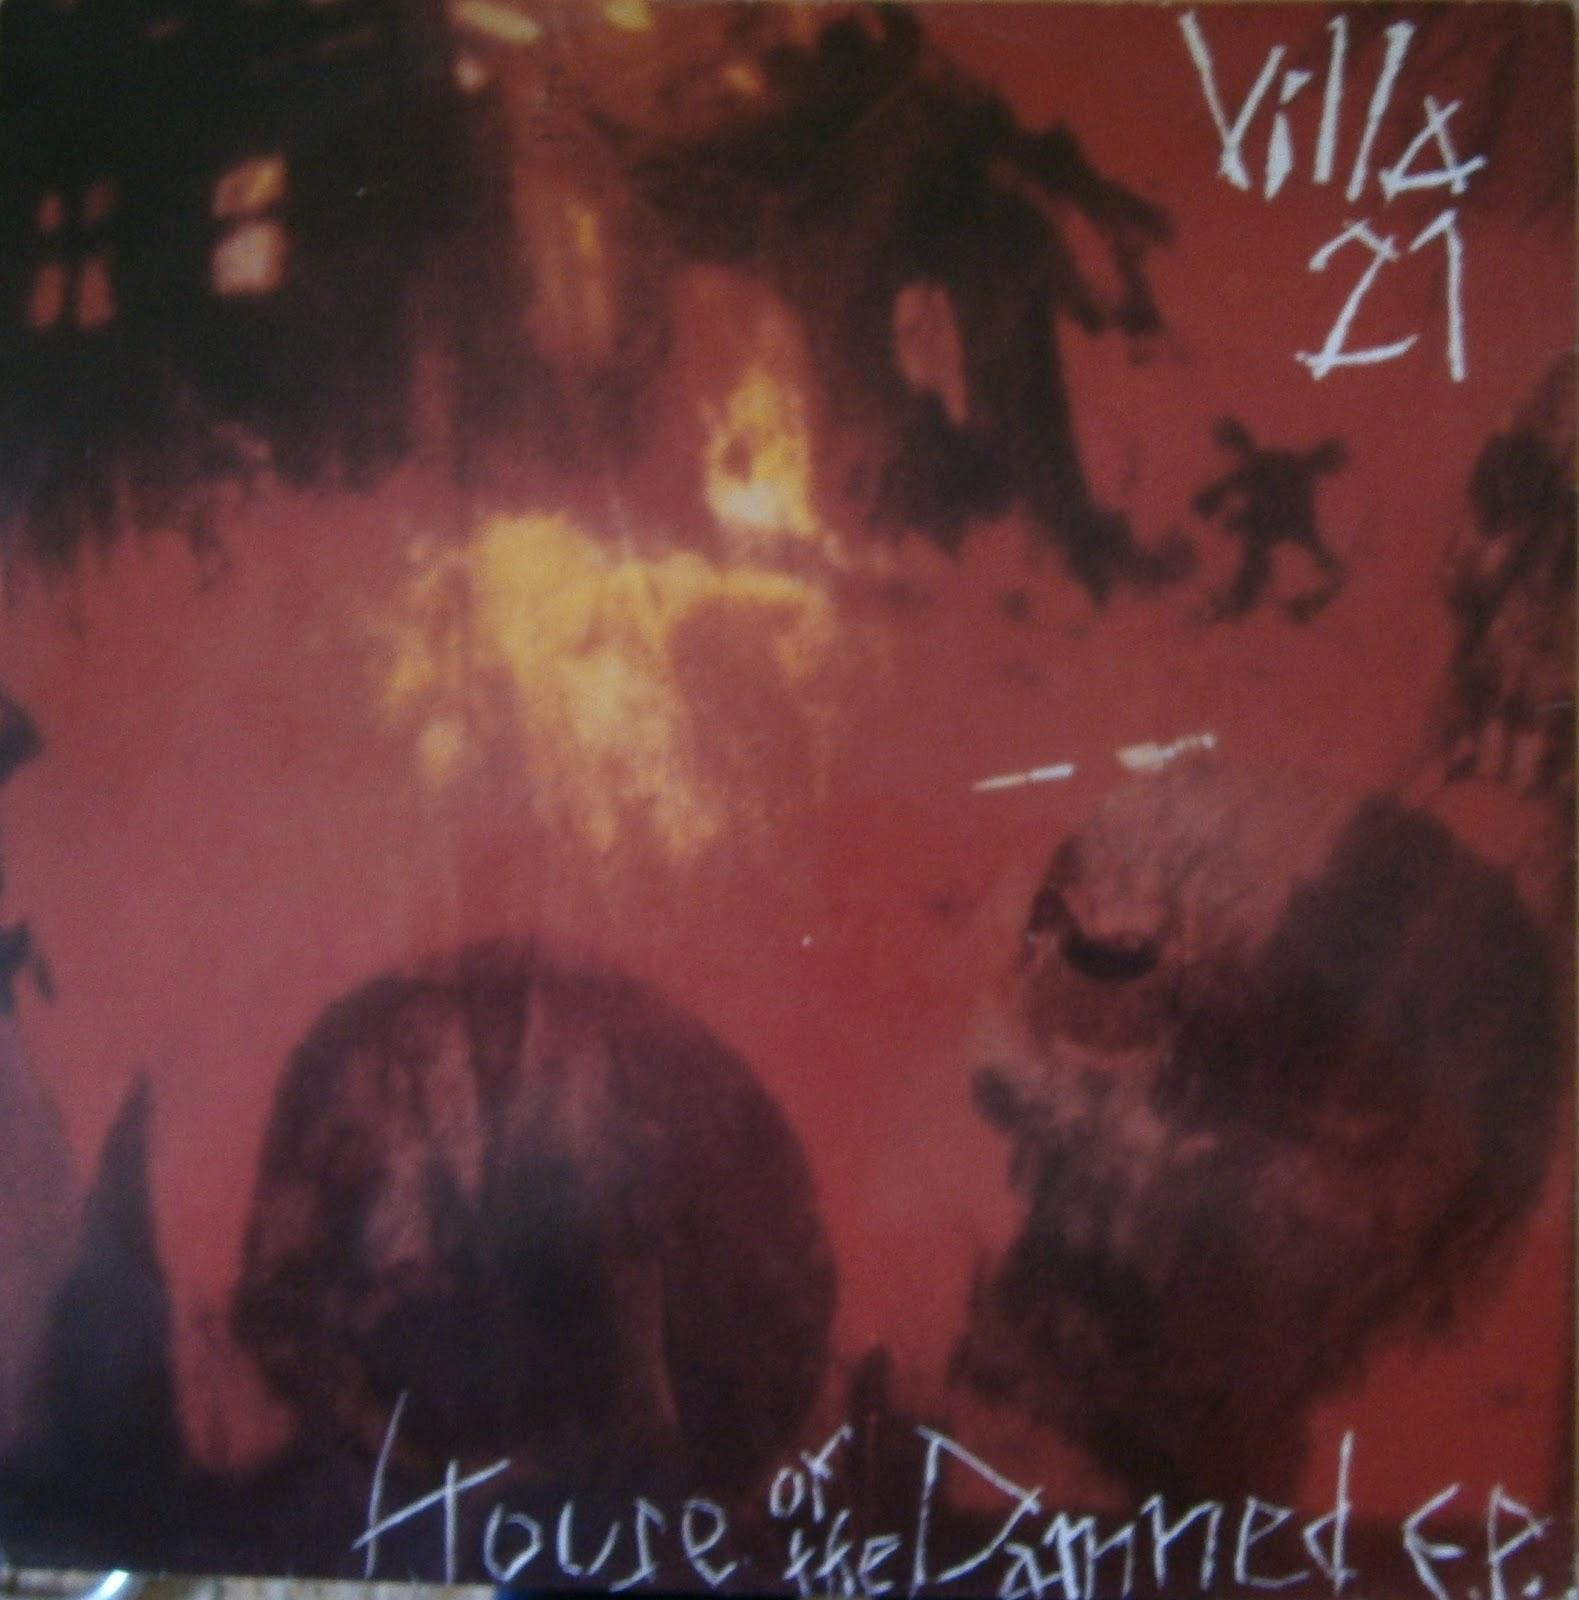 Villa 21 Electric Poison